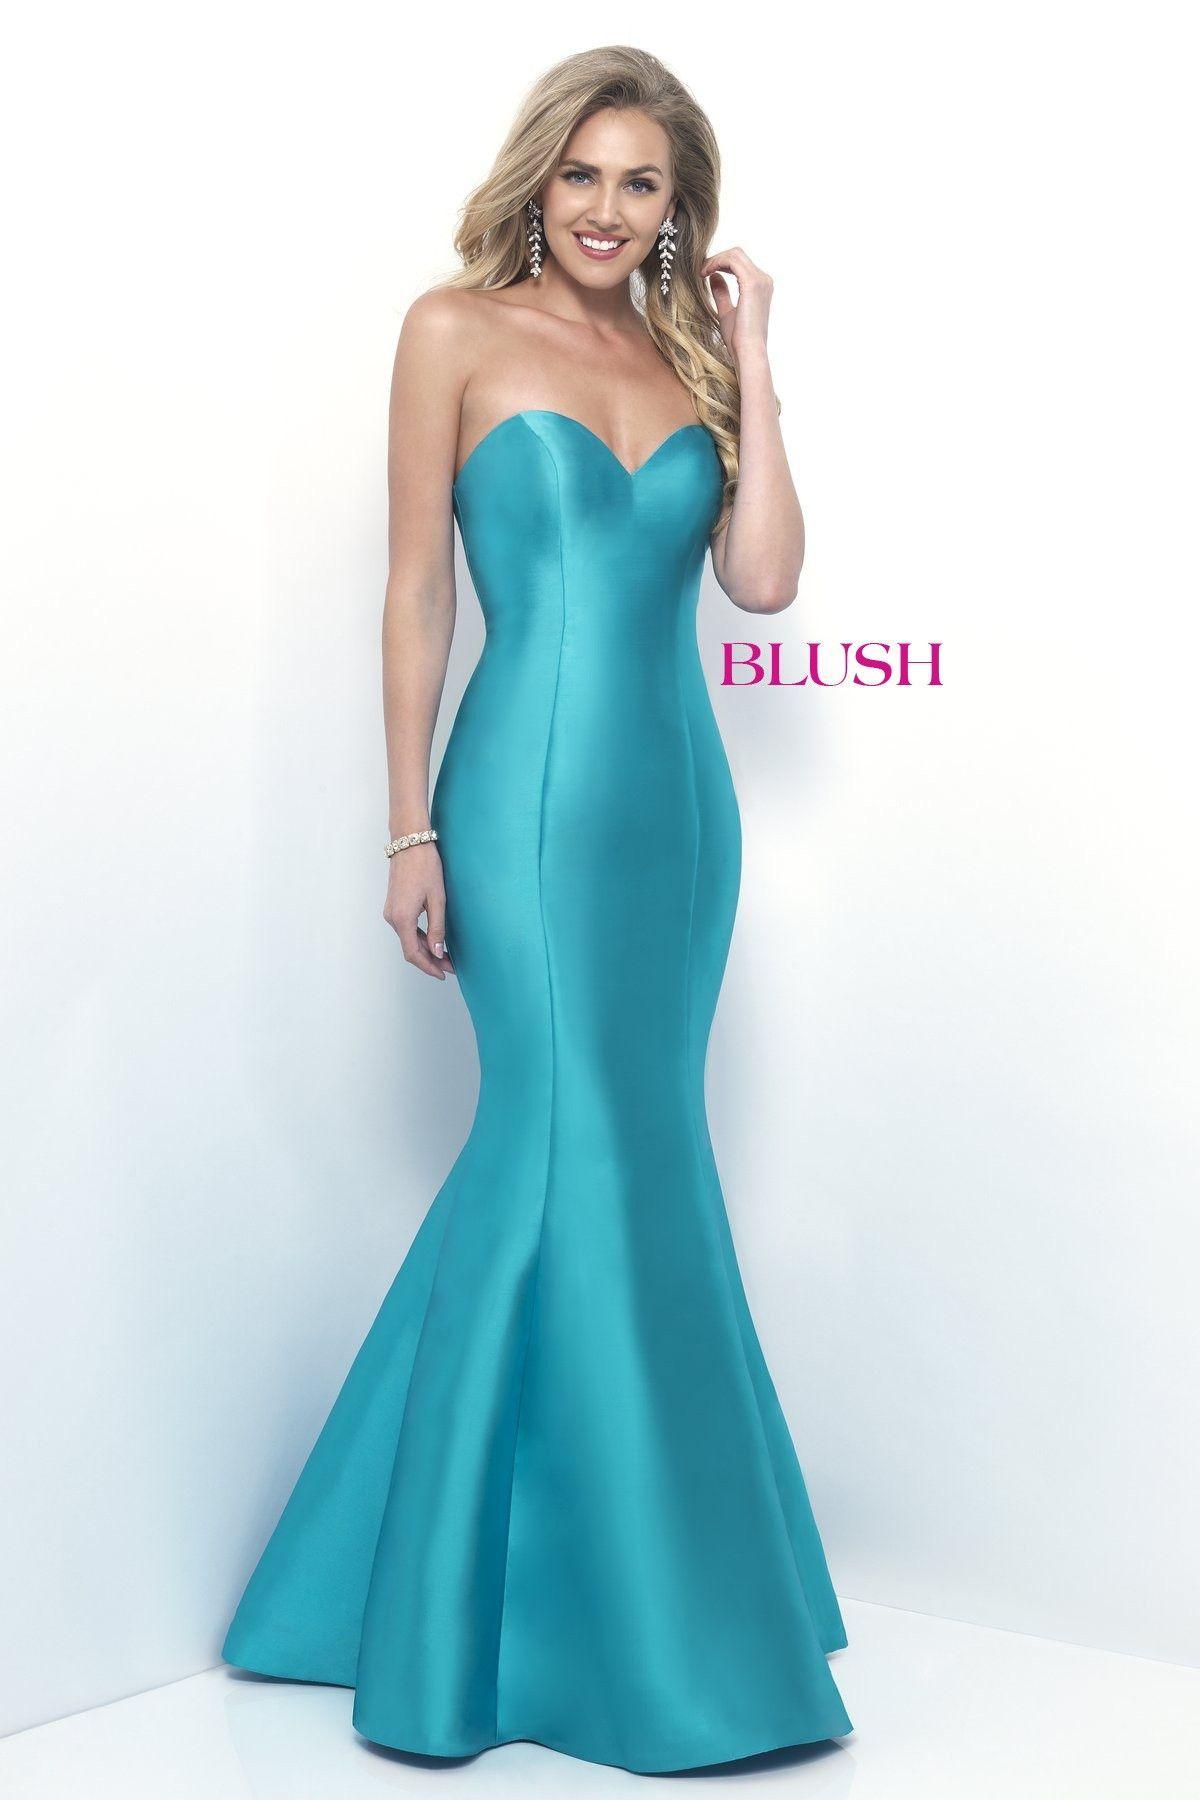 Blush Prom 11238 Turquoise Mermaid Prom Dress | prom dresses ...